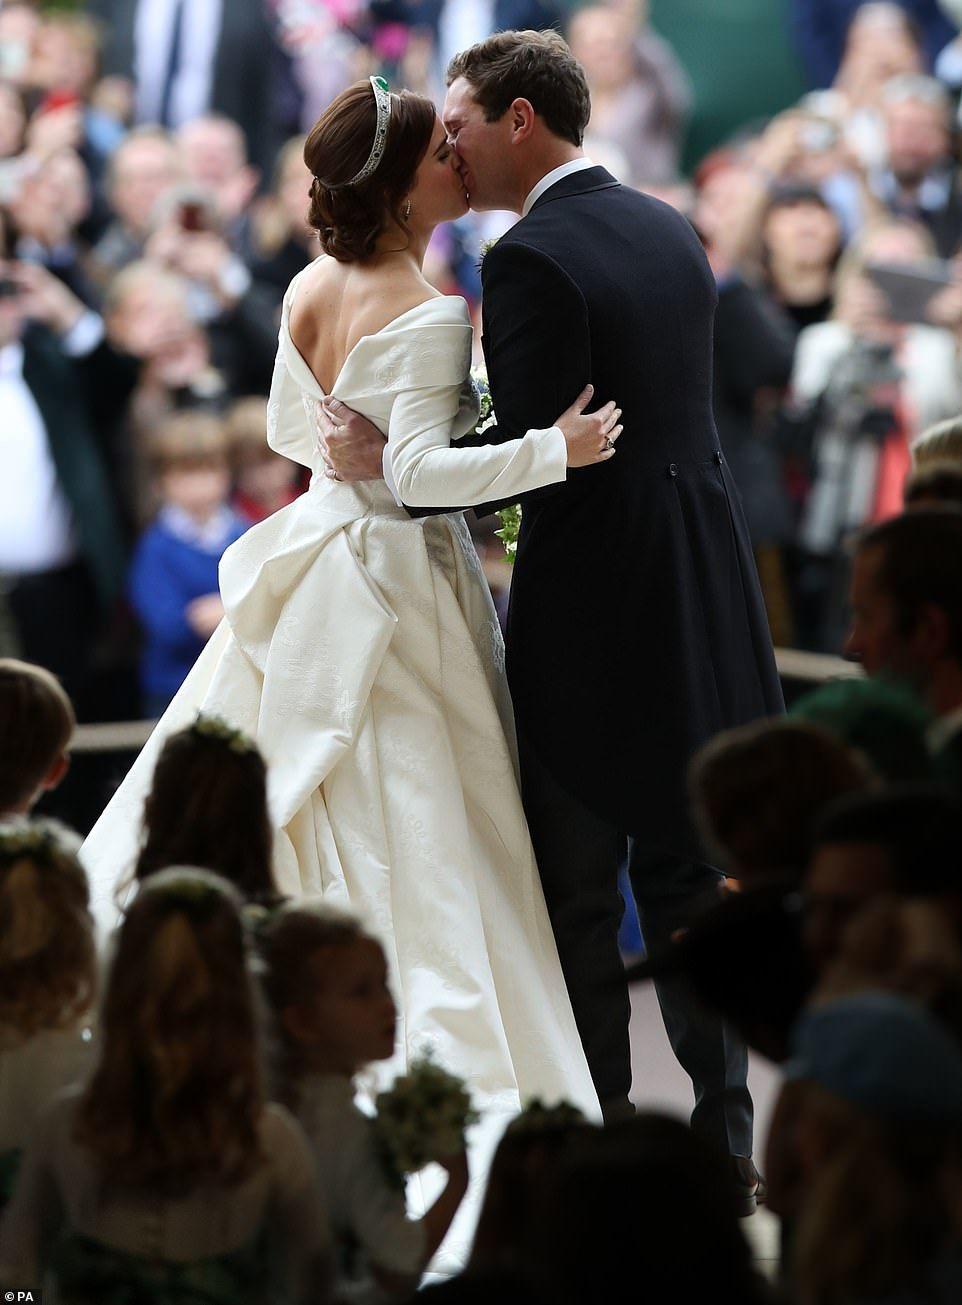 Beautiful Bride Princess Eugenie Marries Jack Brooksbank In Windsor Eugenie Wedding Princess Eugenie Jack Brooksbank Princess Eugenie [ 1305 x 962 Pixel ]